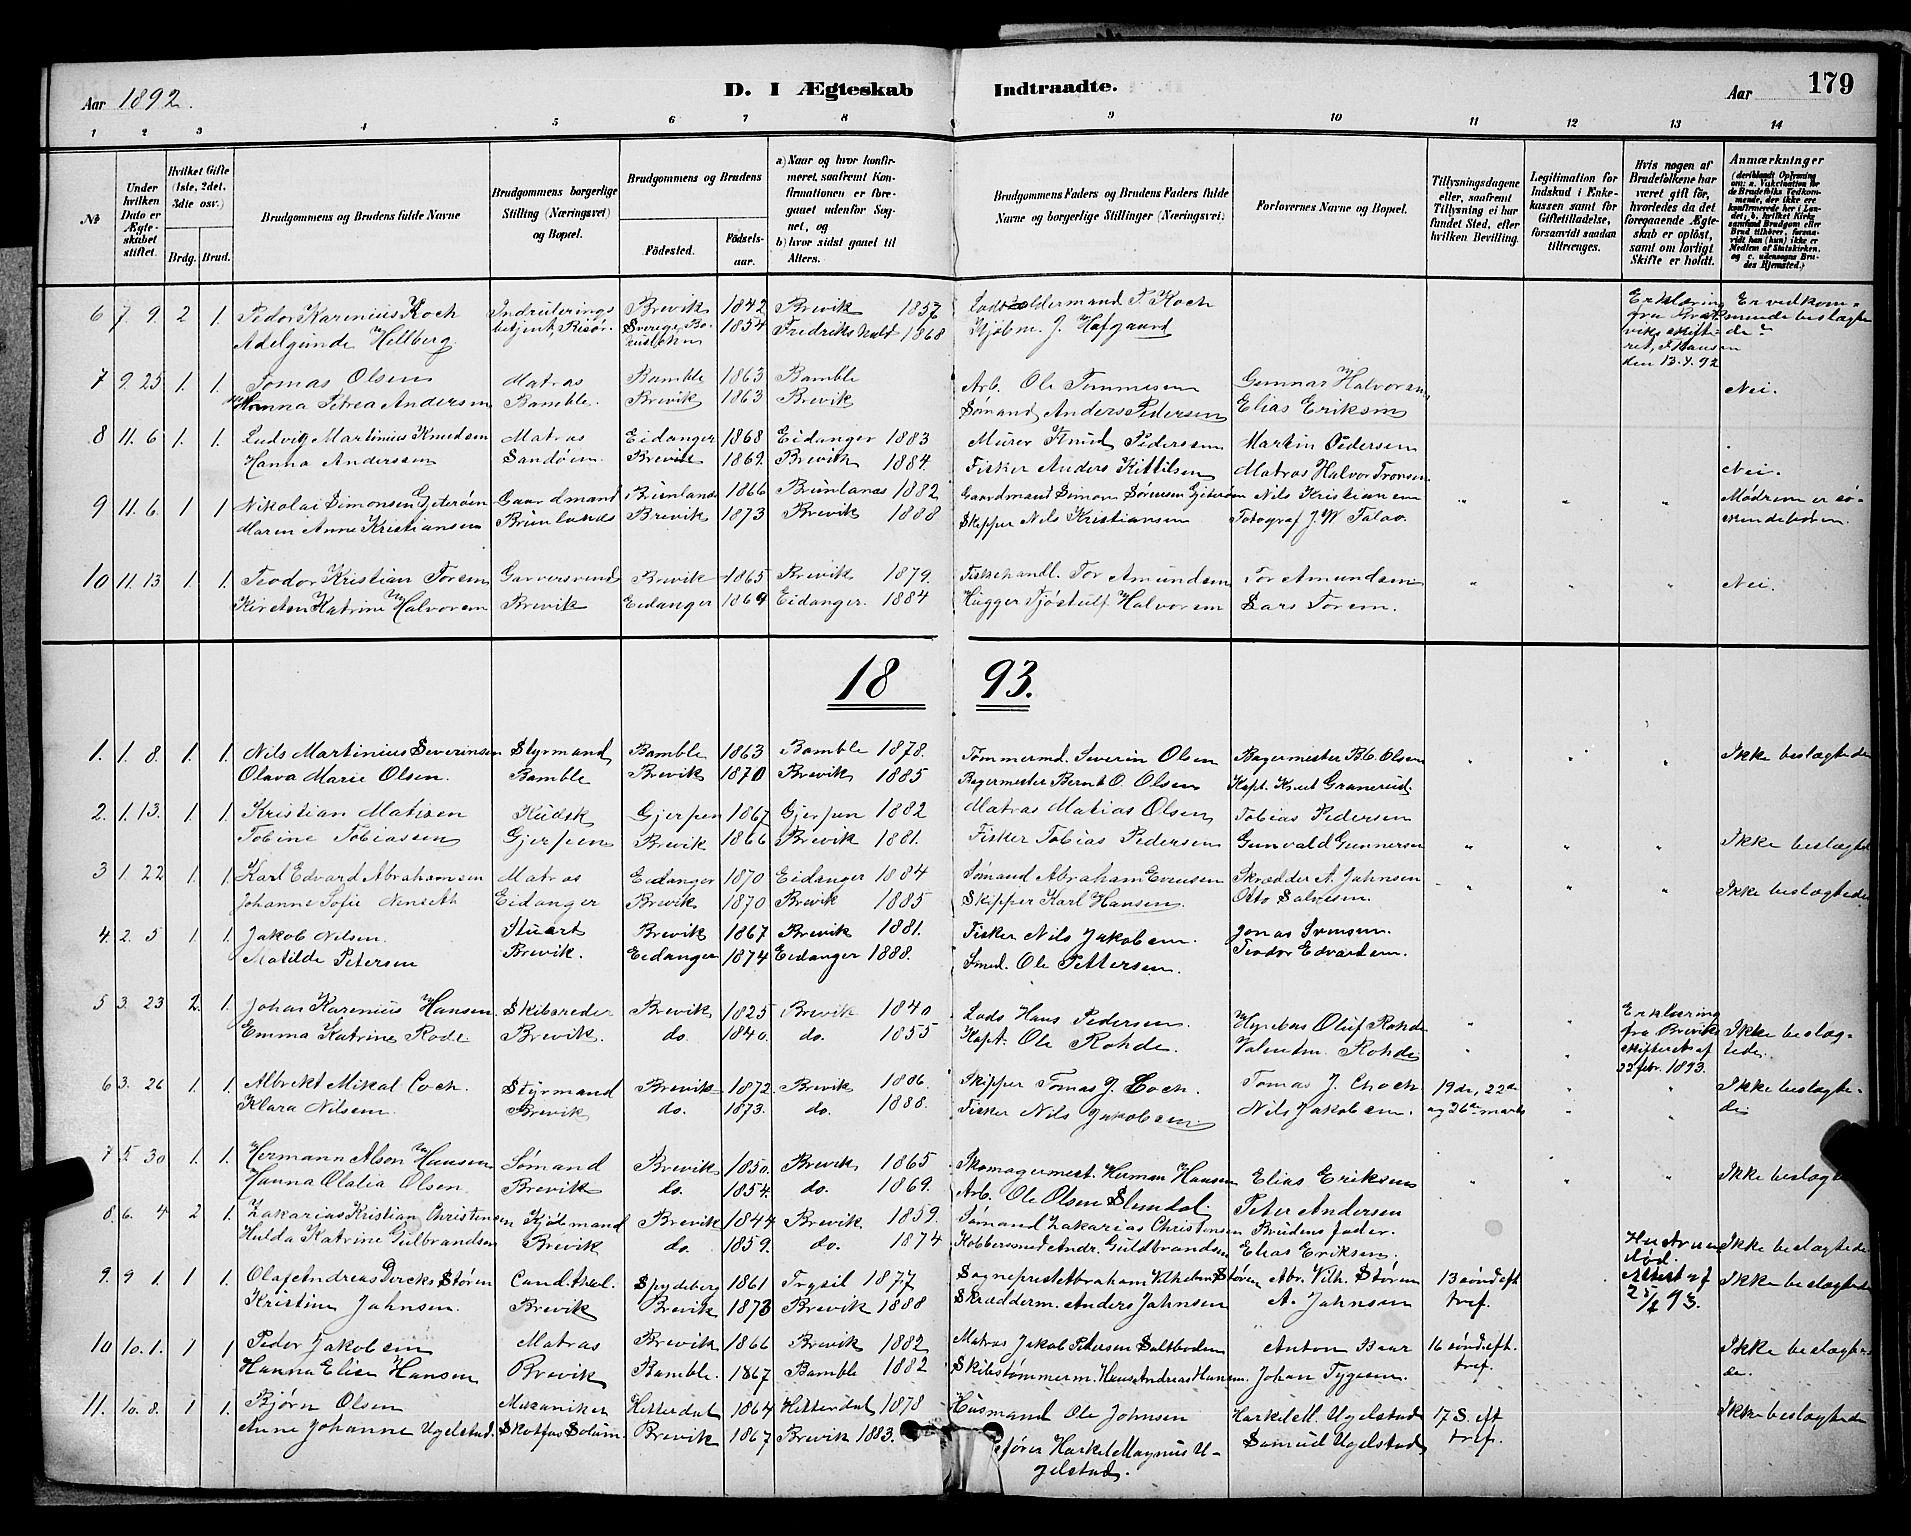 SAKO, Brevik kirkebøker, G/Ga/L0004: Klokkerbok nr. 4, 1882-1900, s. 179